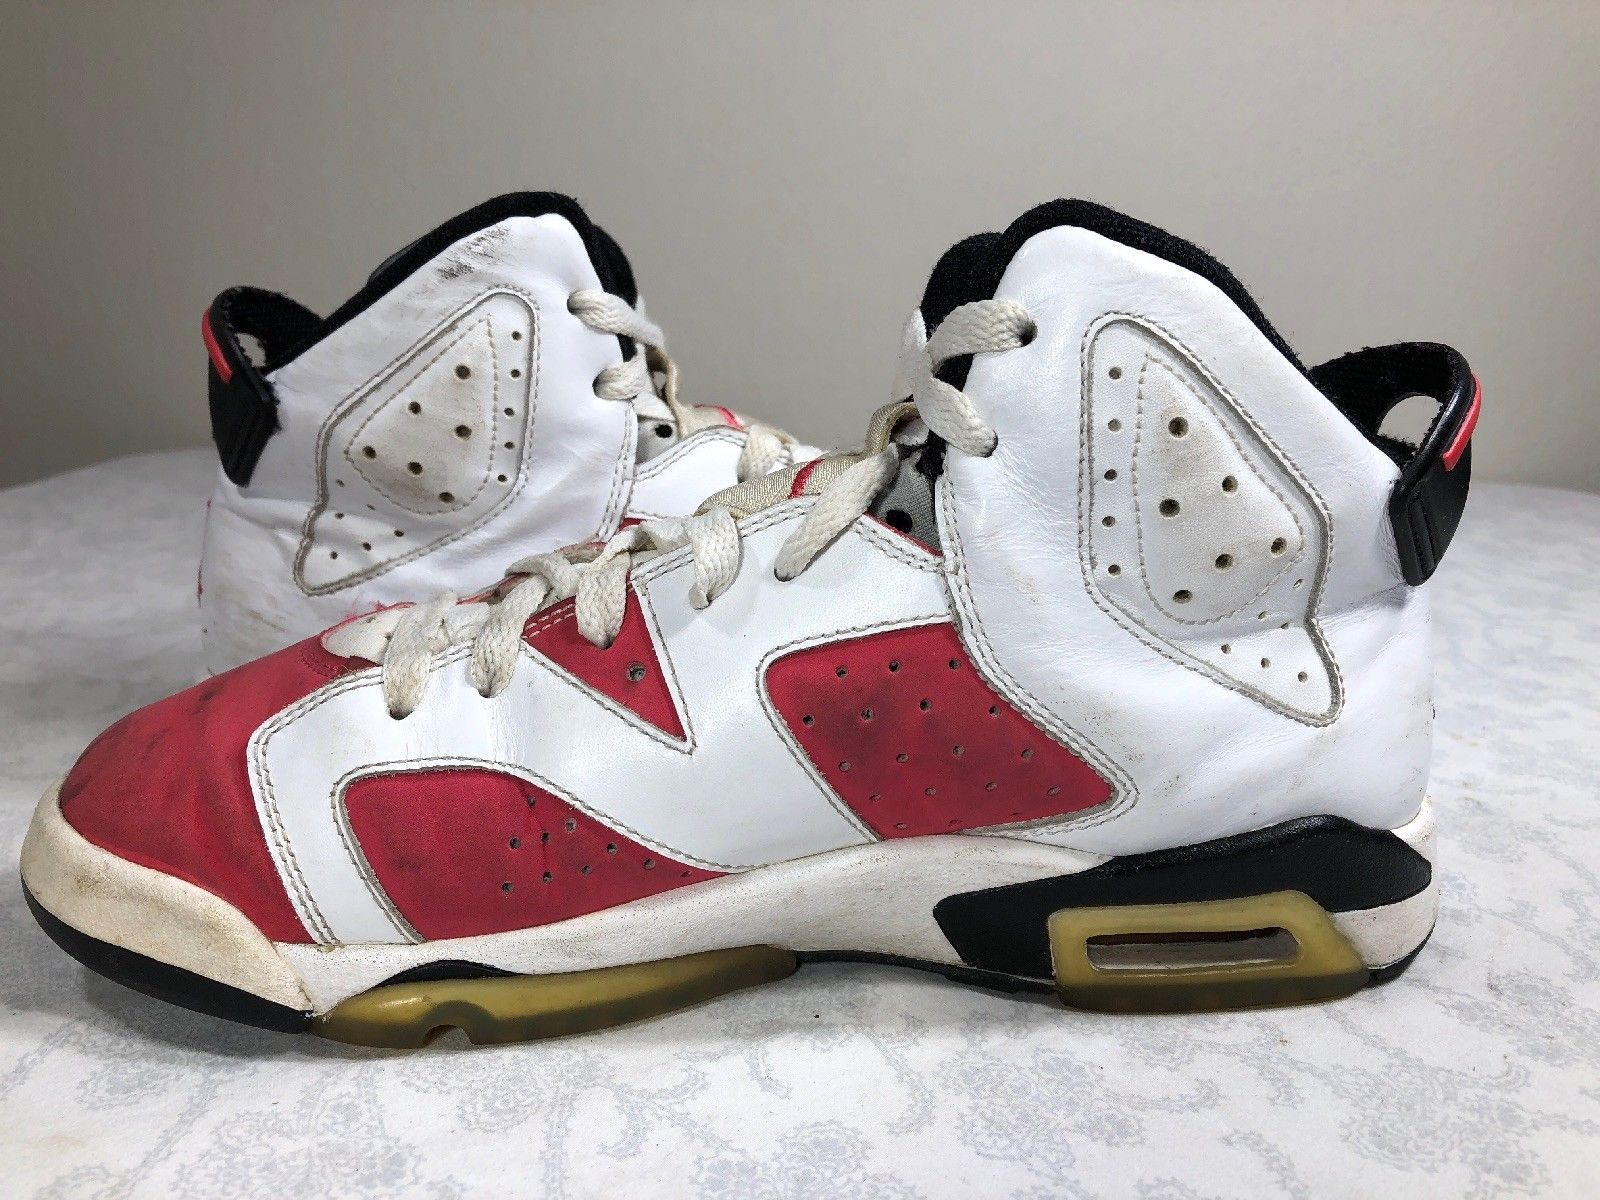 2009 Nike Air Jordan Retro VI 6 White Pink Girls GS 7y Oreo Carmine Infrared